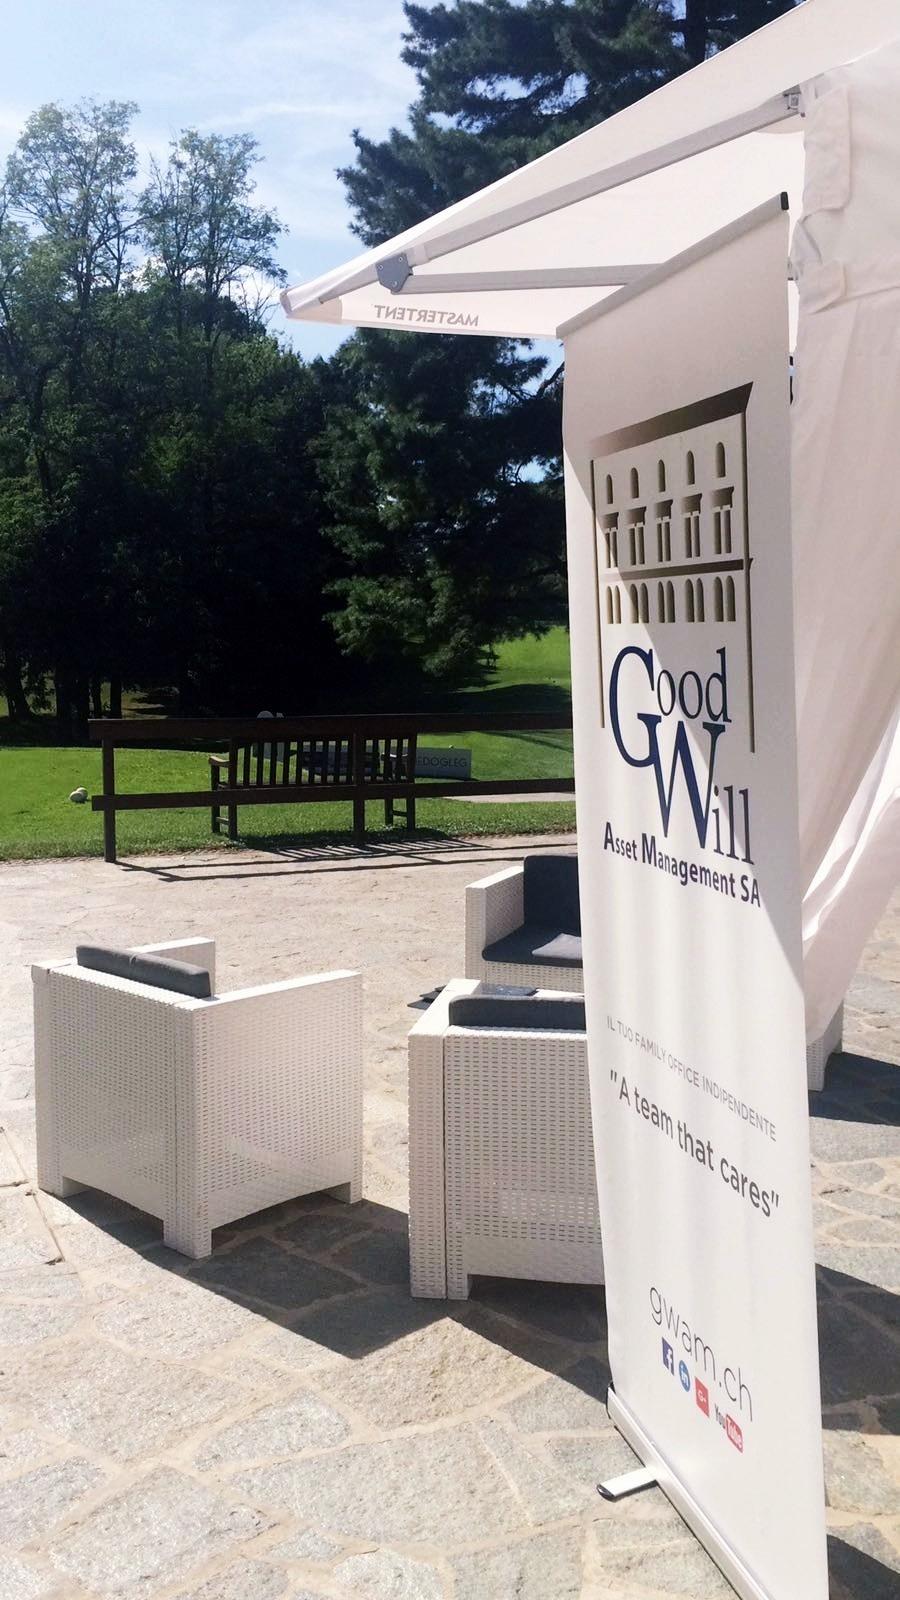 EVENTI IN CANTON TICINO 27  Goodwill Asset Management SA